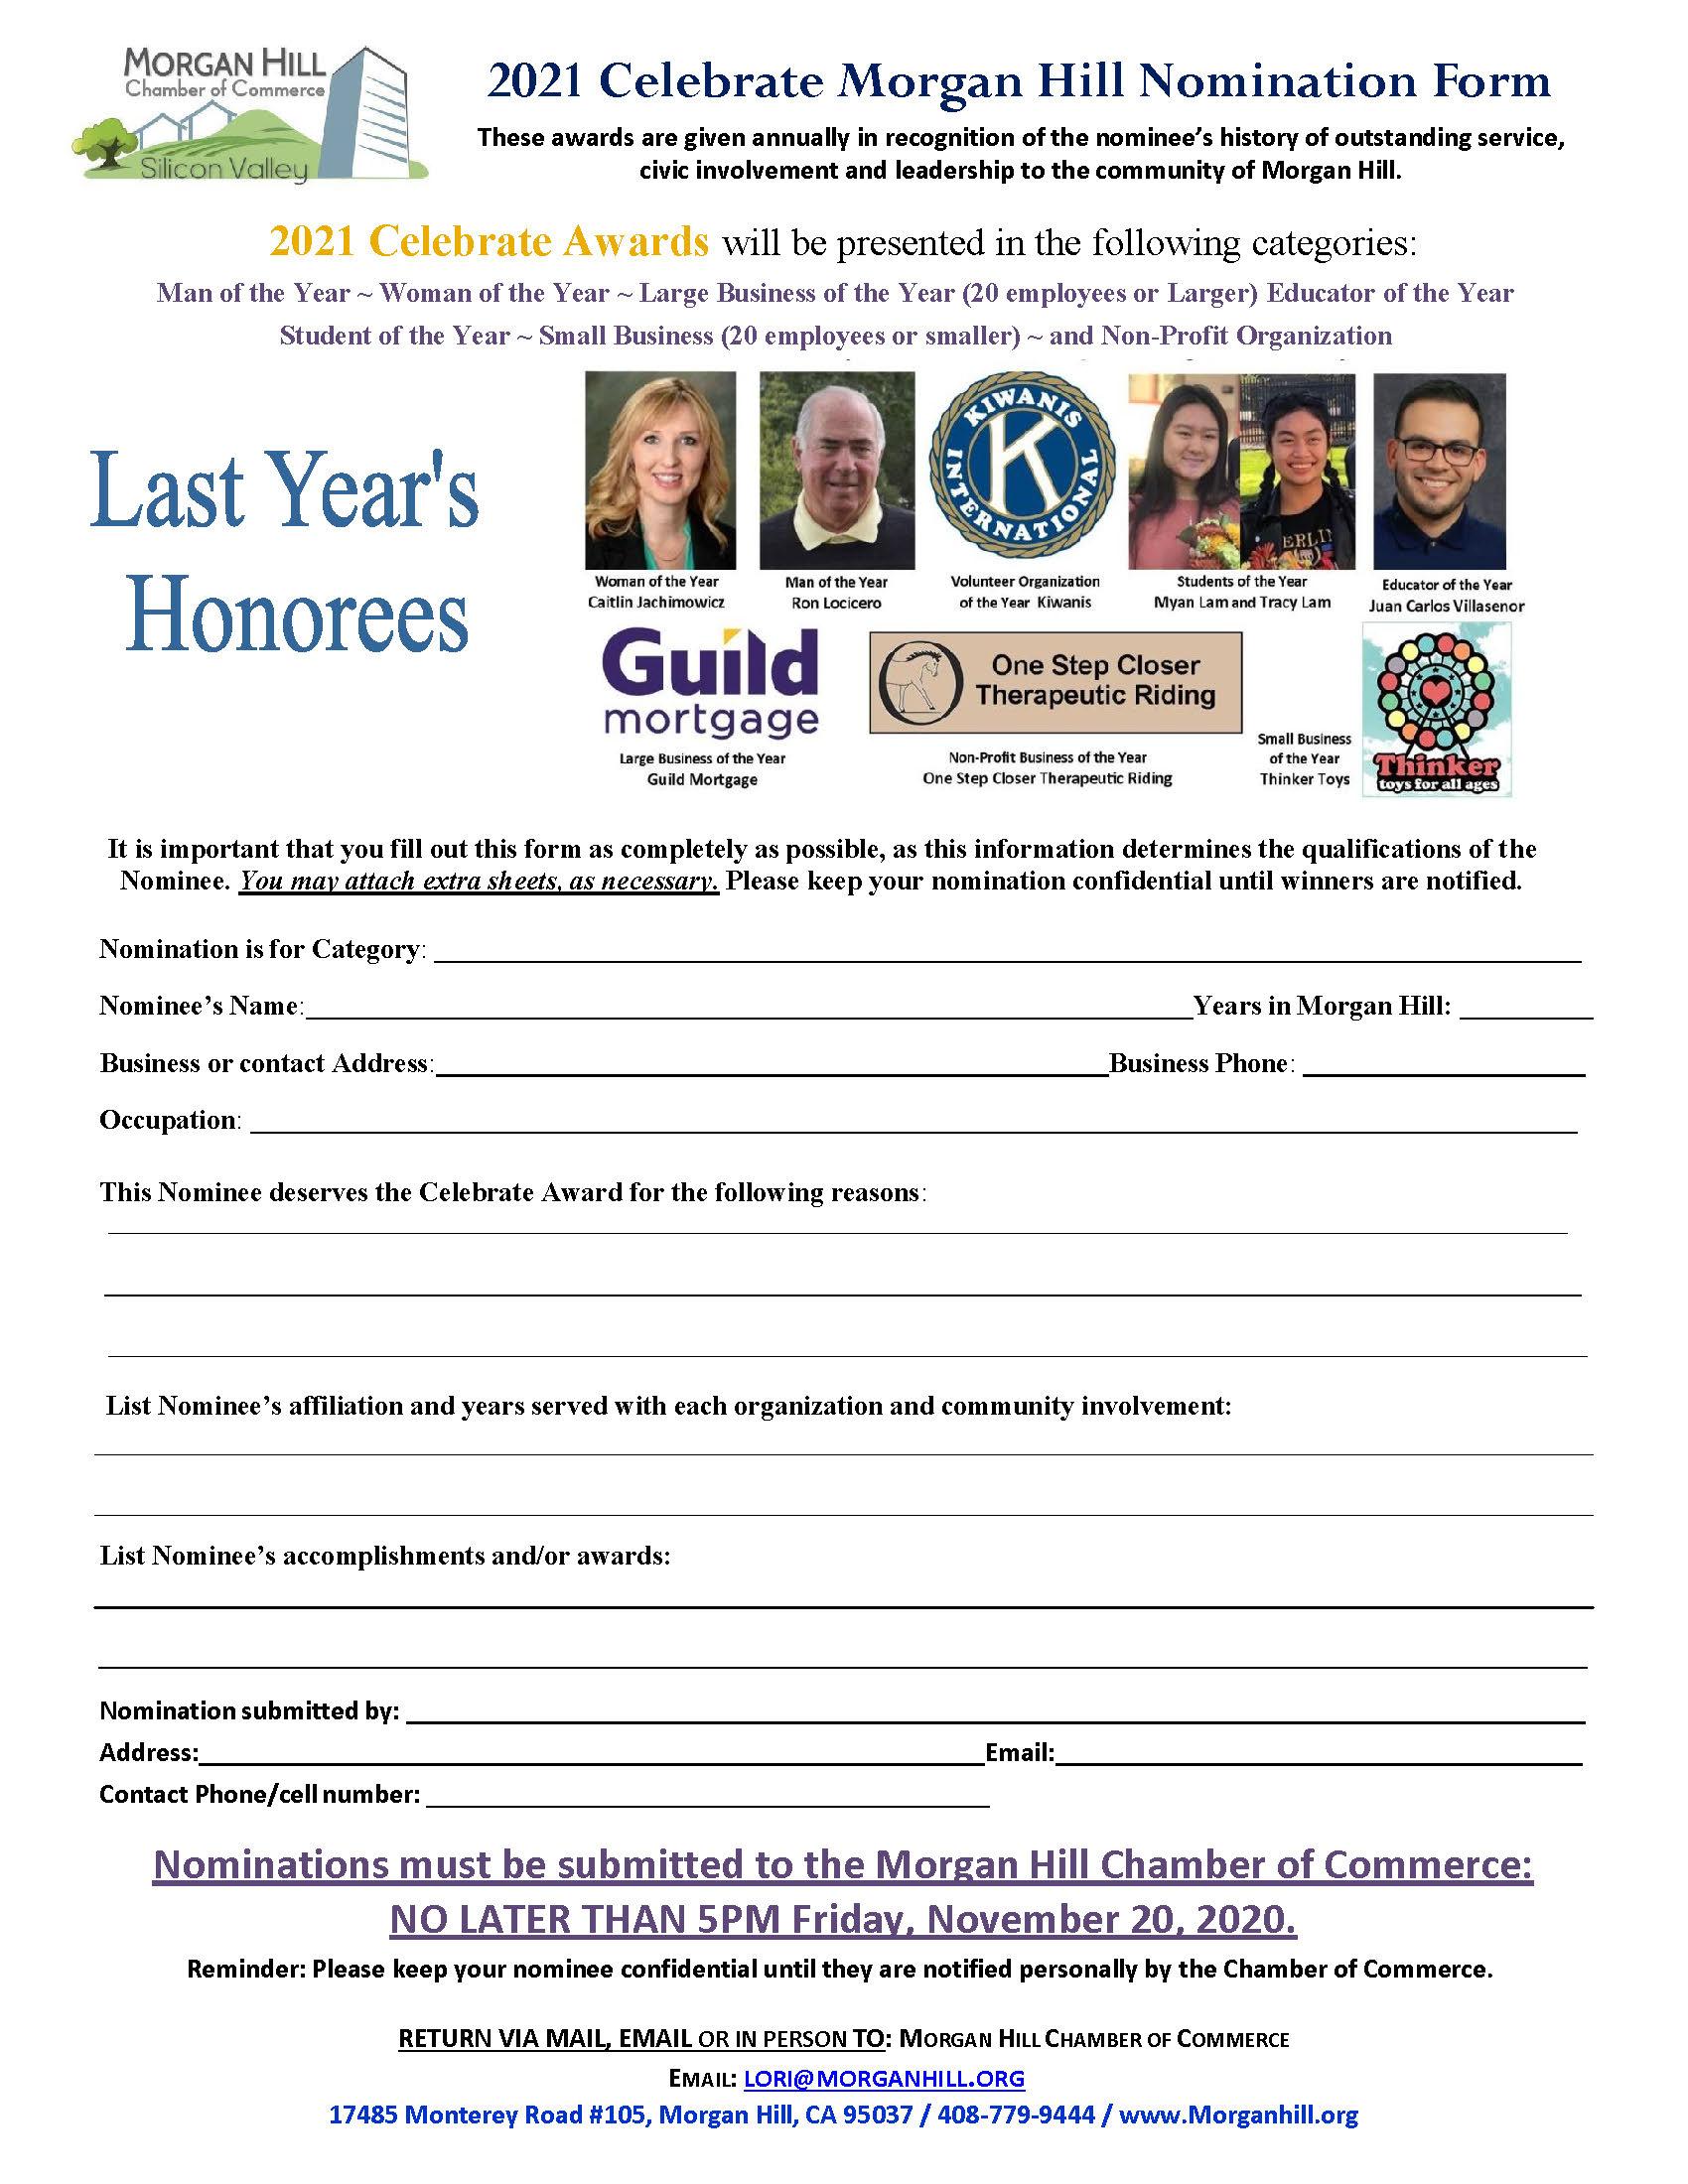 2021 Celebrate Nomination Form wphotos